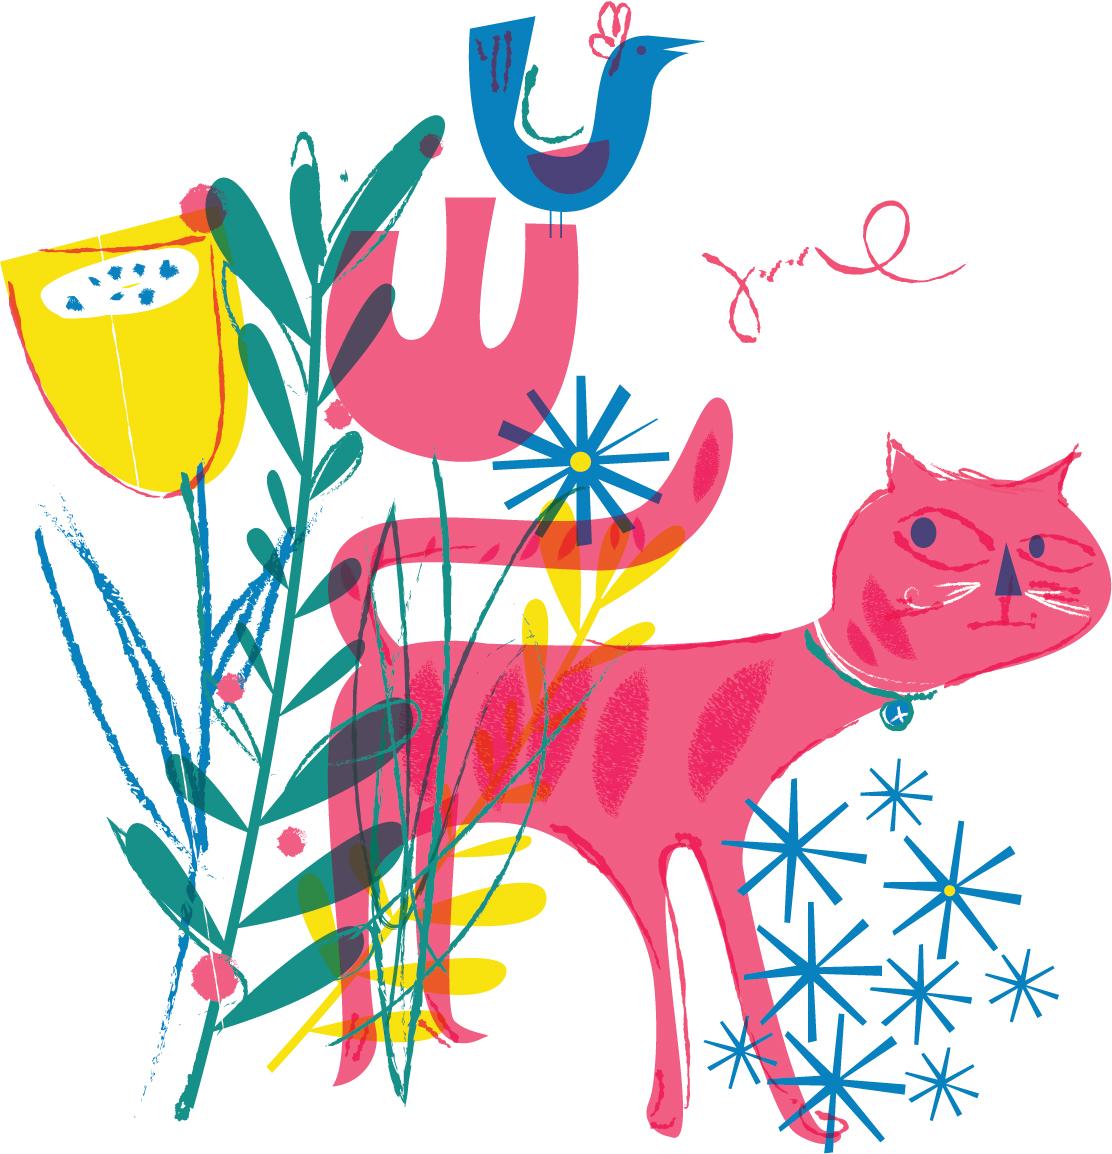 Cat & Flowers